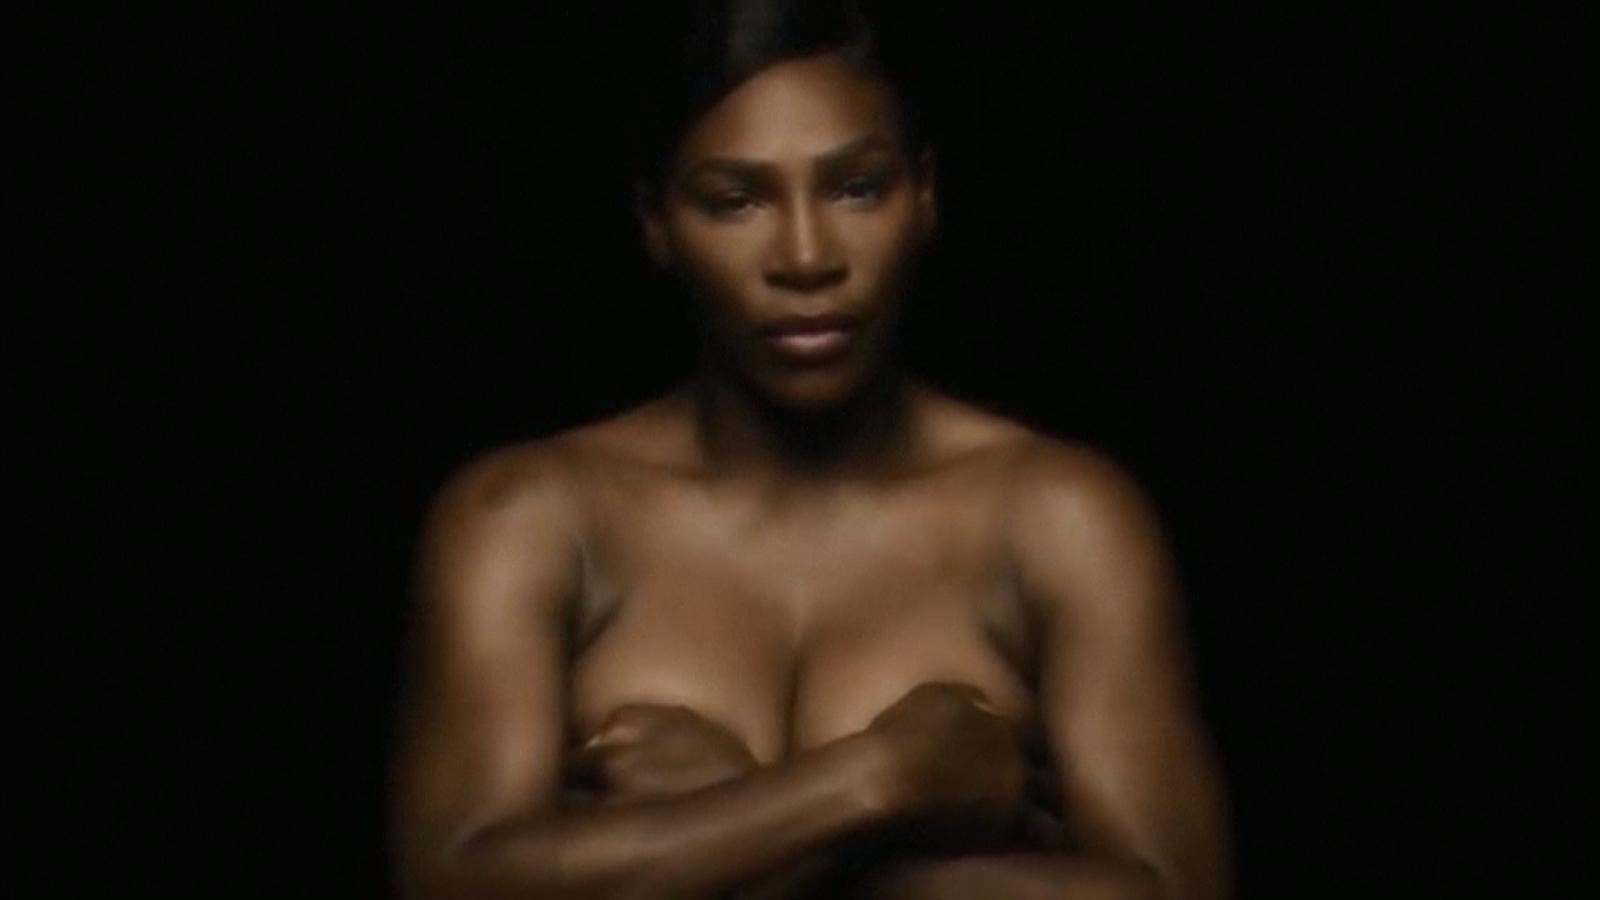 Serina williams photos nude